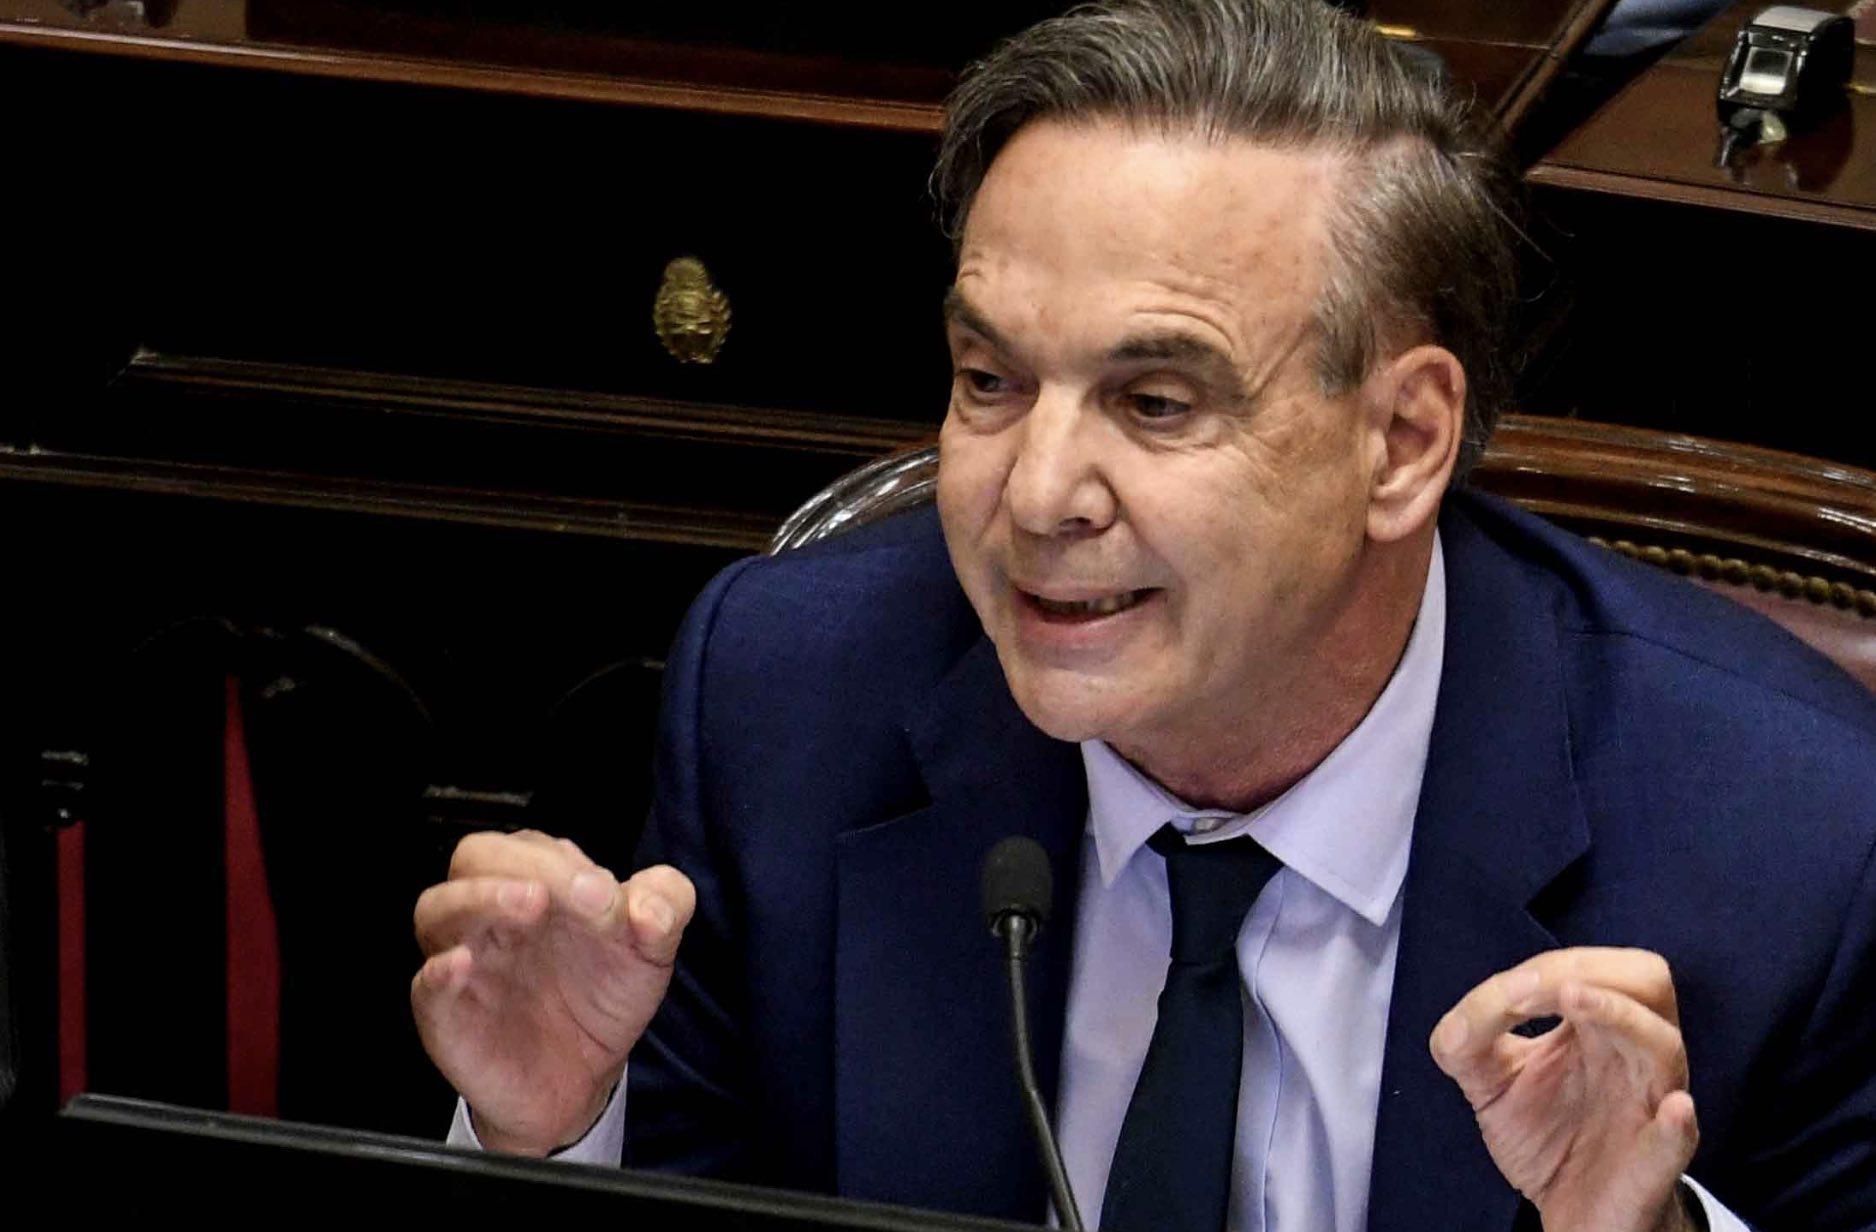 Miguel Pichetto, Política argentina, Sergio Nerguizian